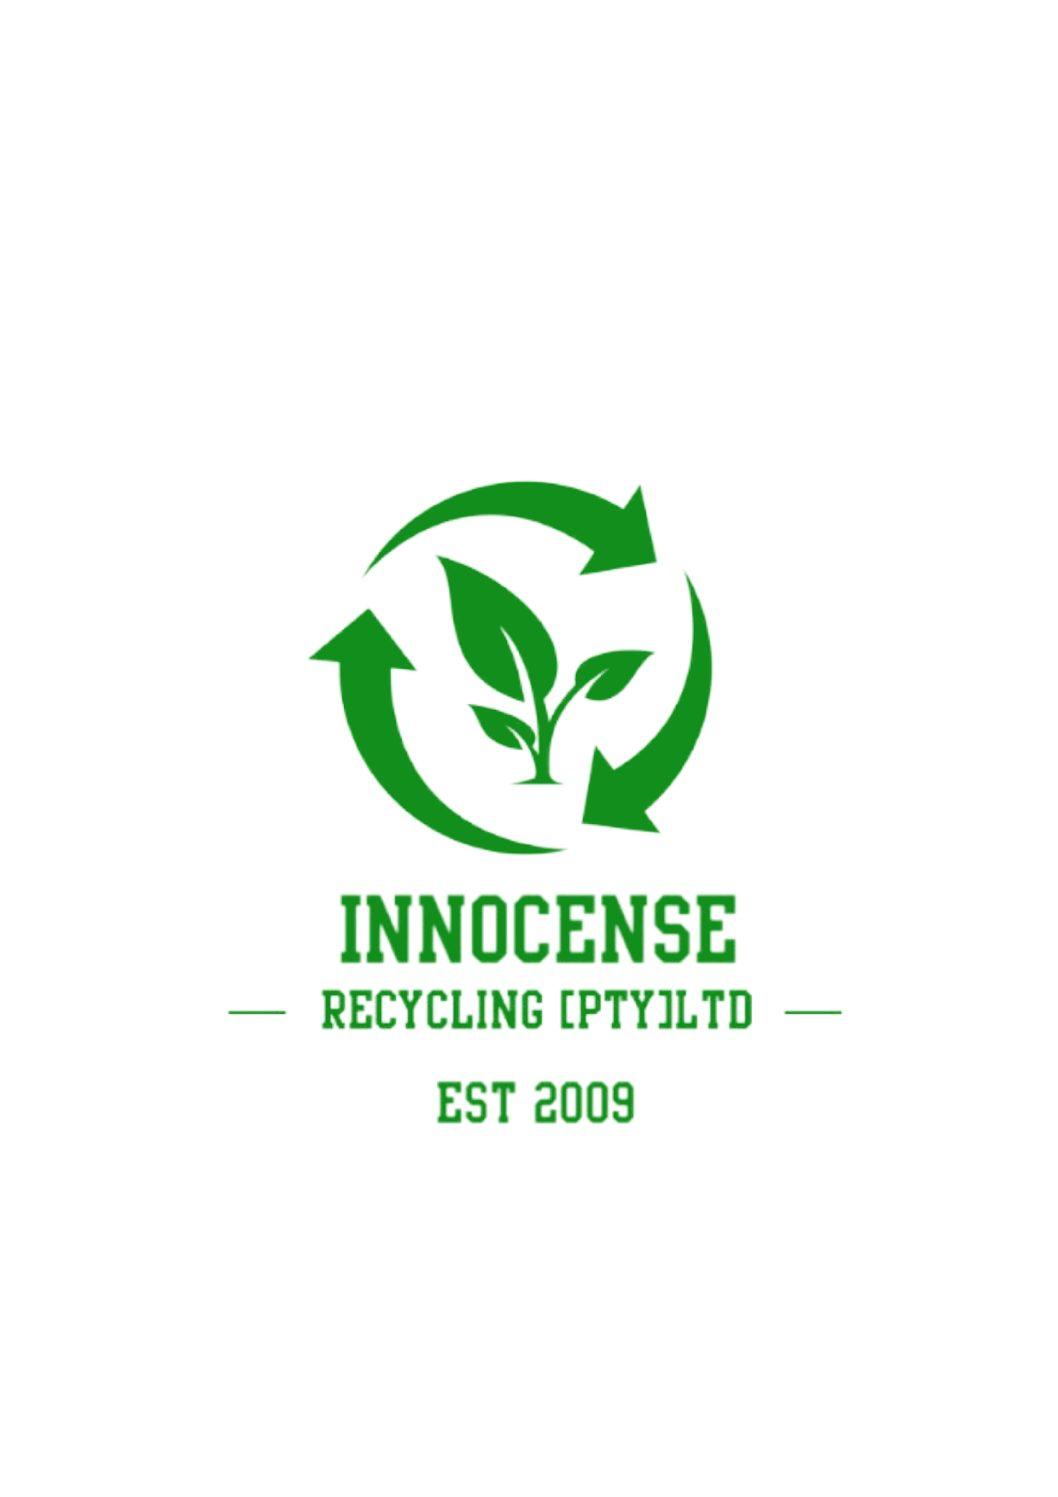 Innocense Recycling